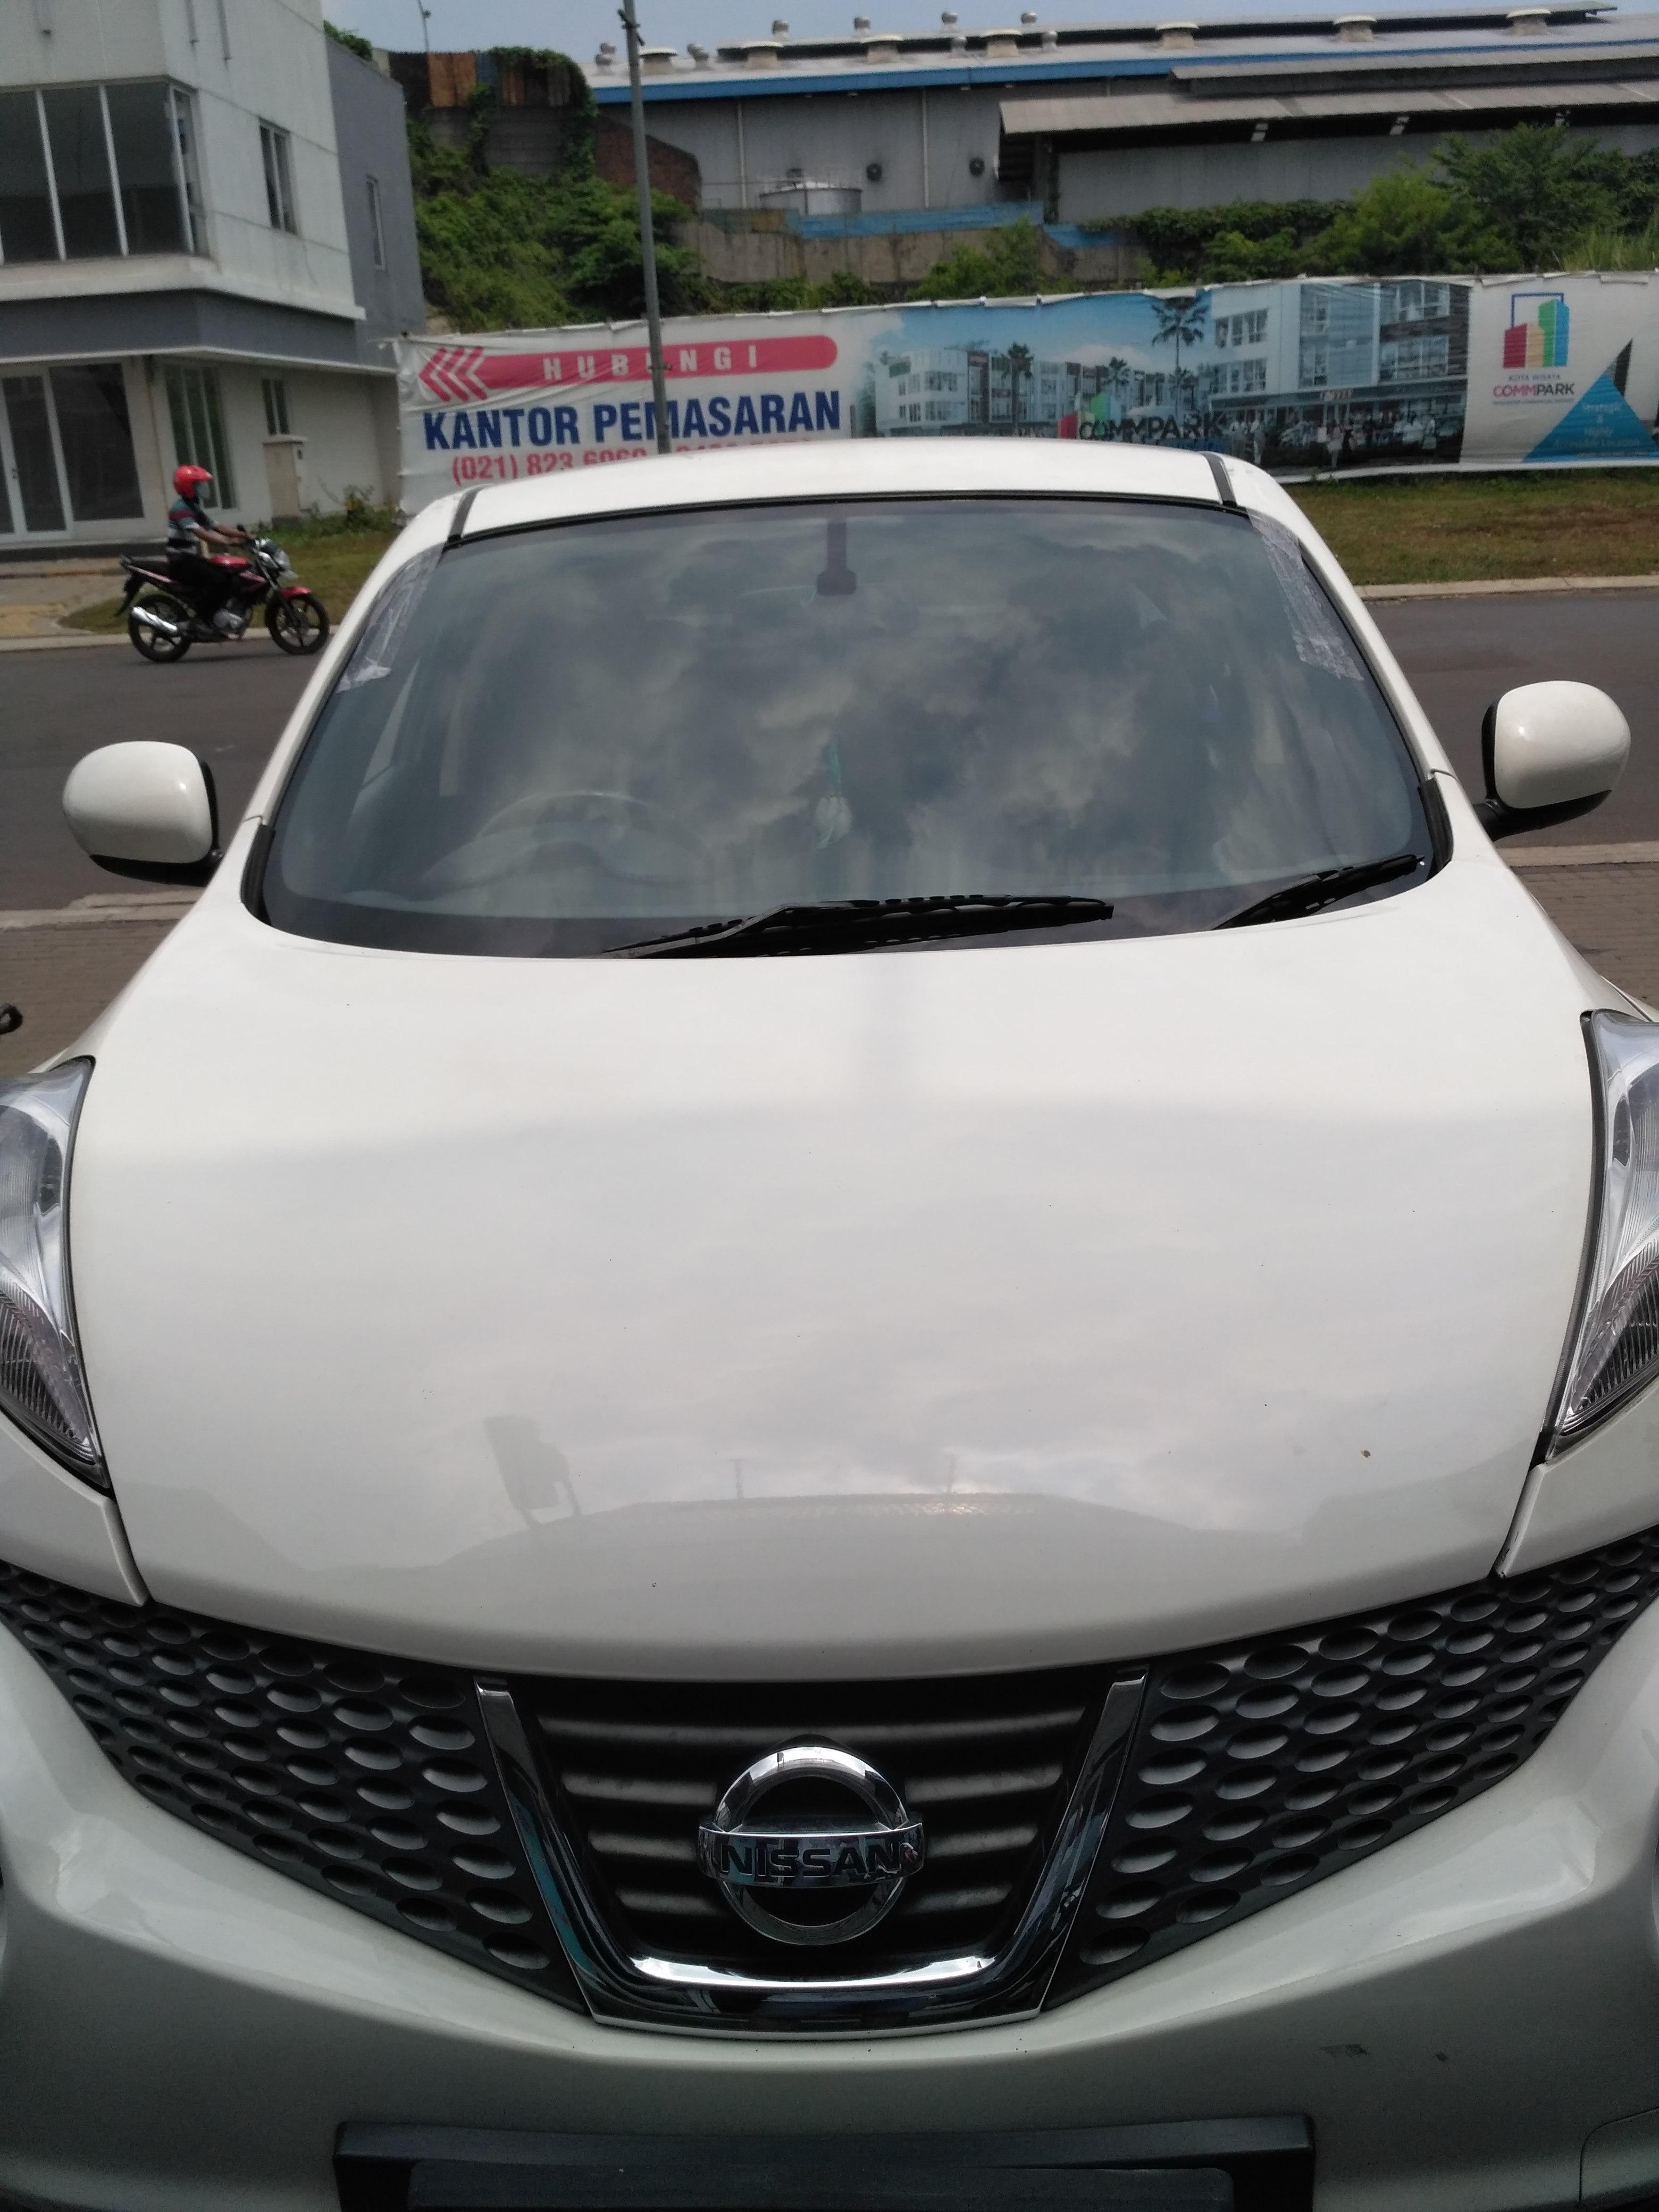 Bengkel Kaca Mobil Terbaik di Surabaya